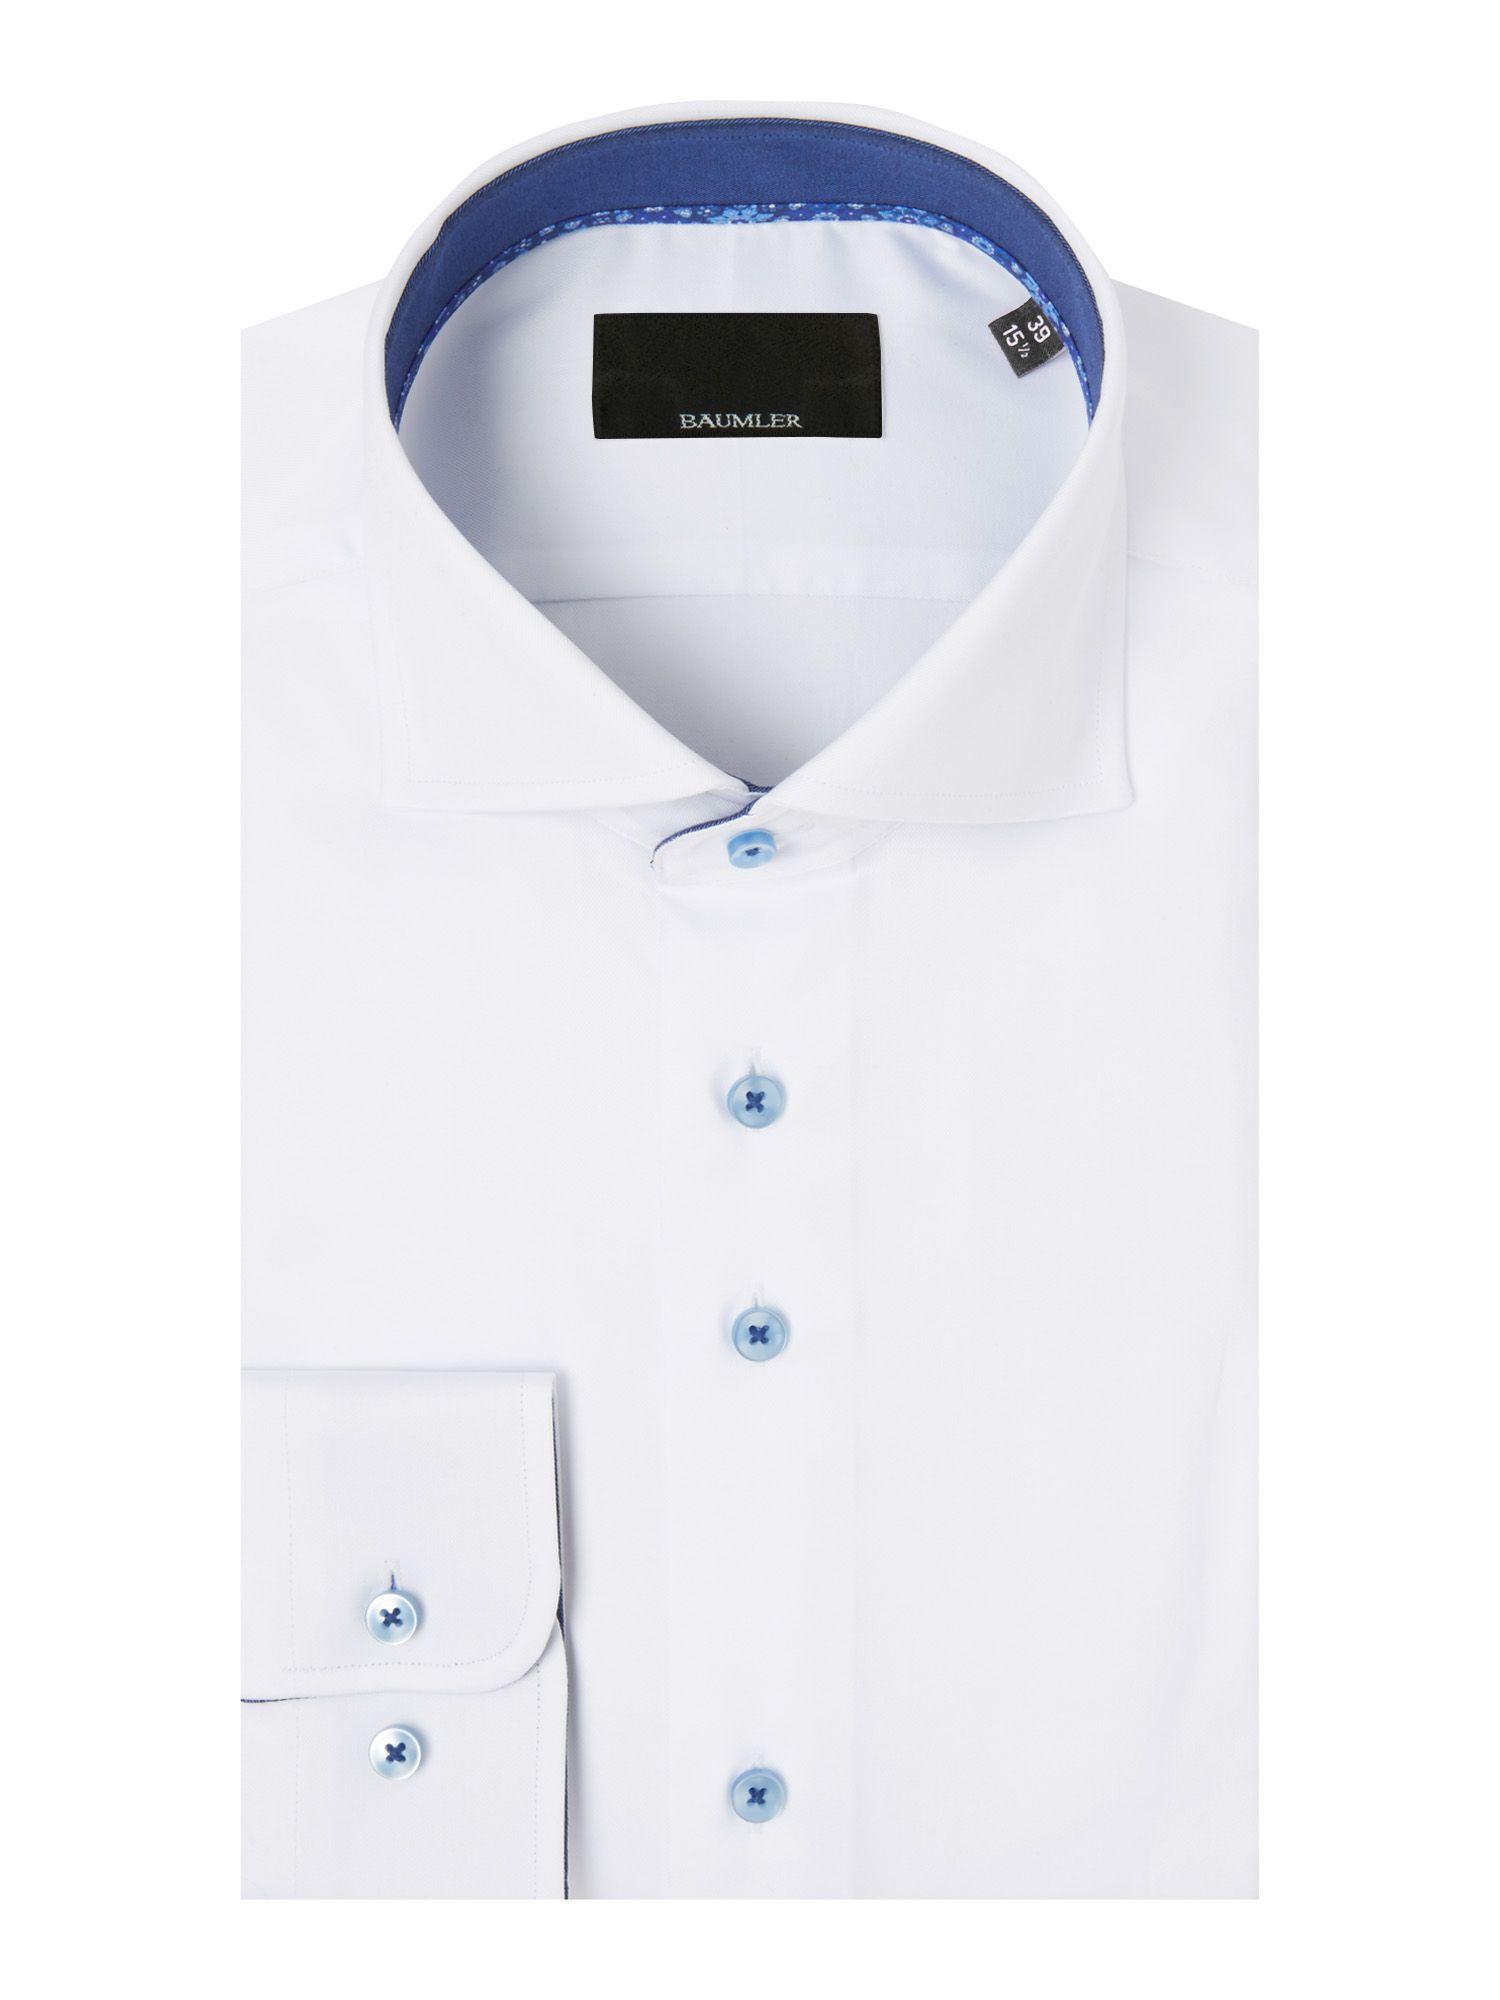 B umler white single cuff shirt in white for men lyst for Single cuff dress shirt